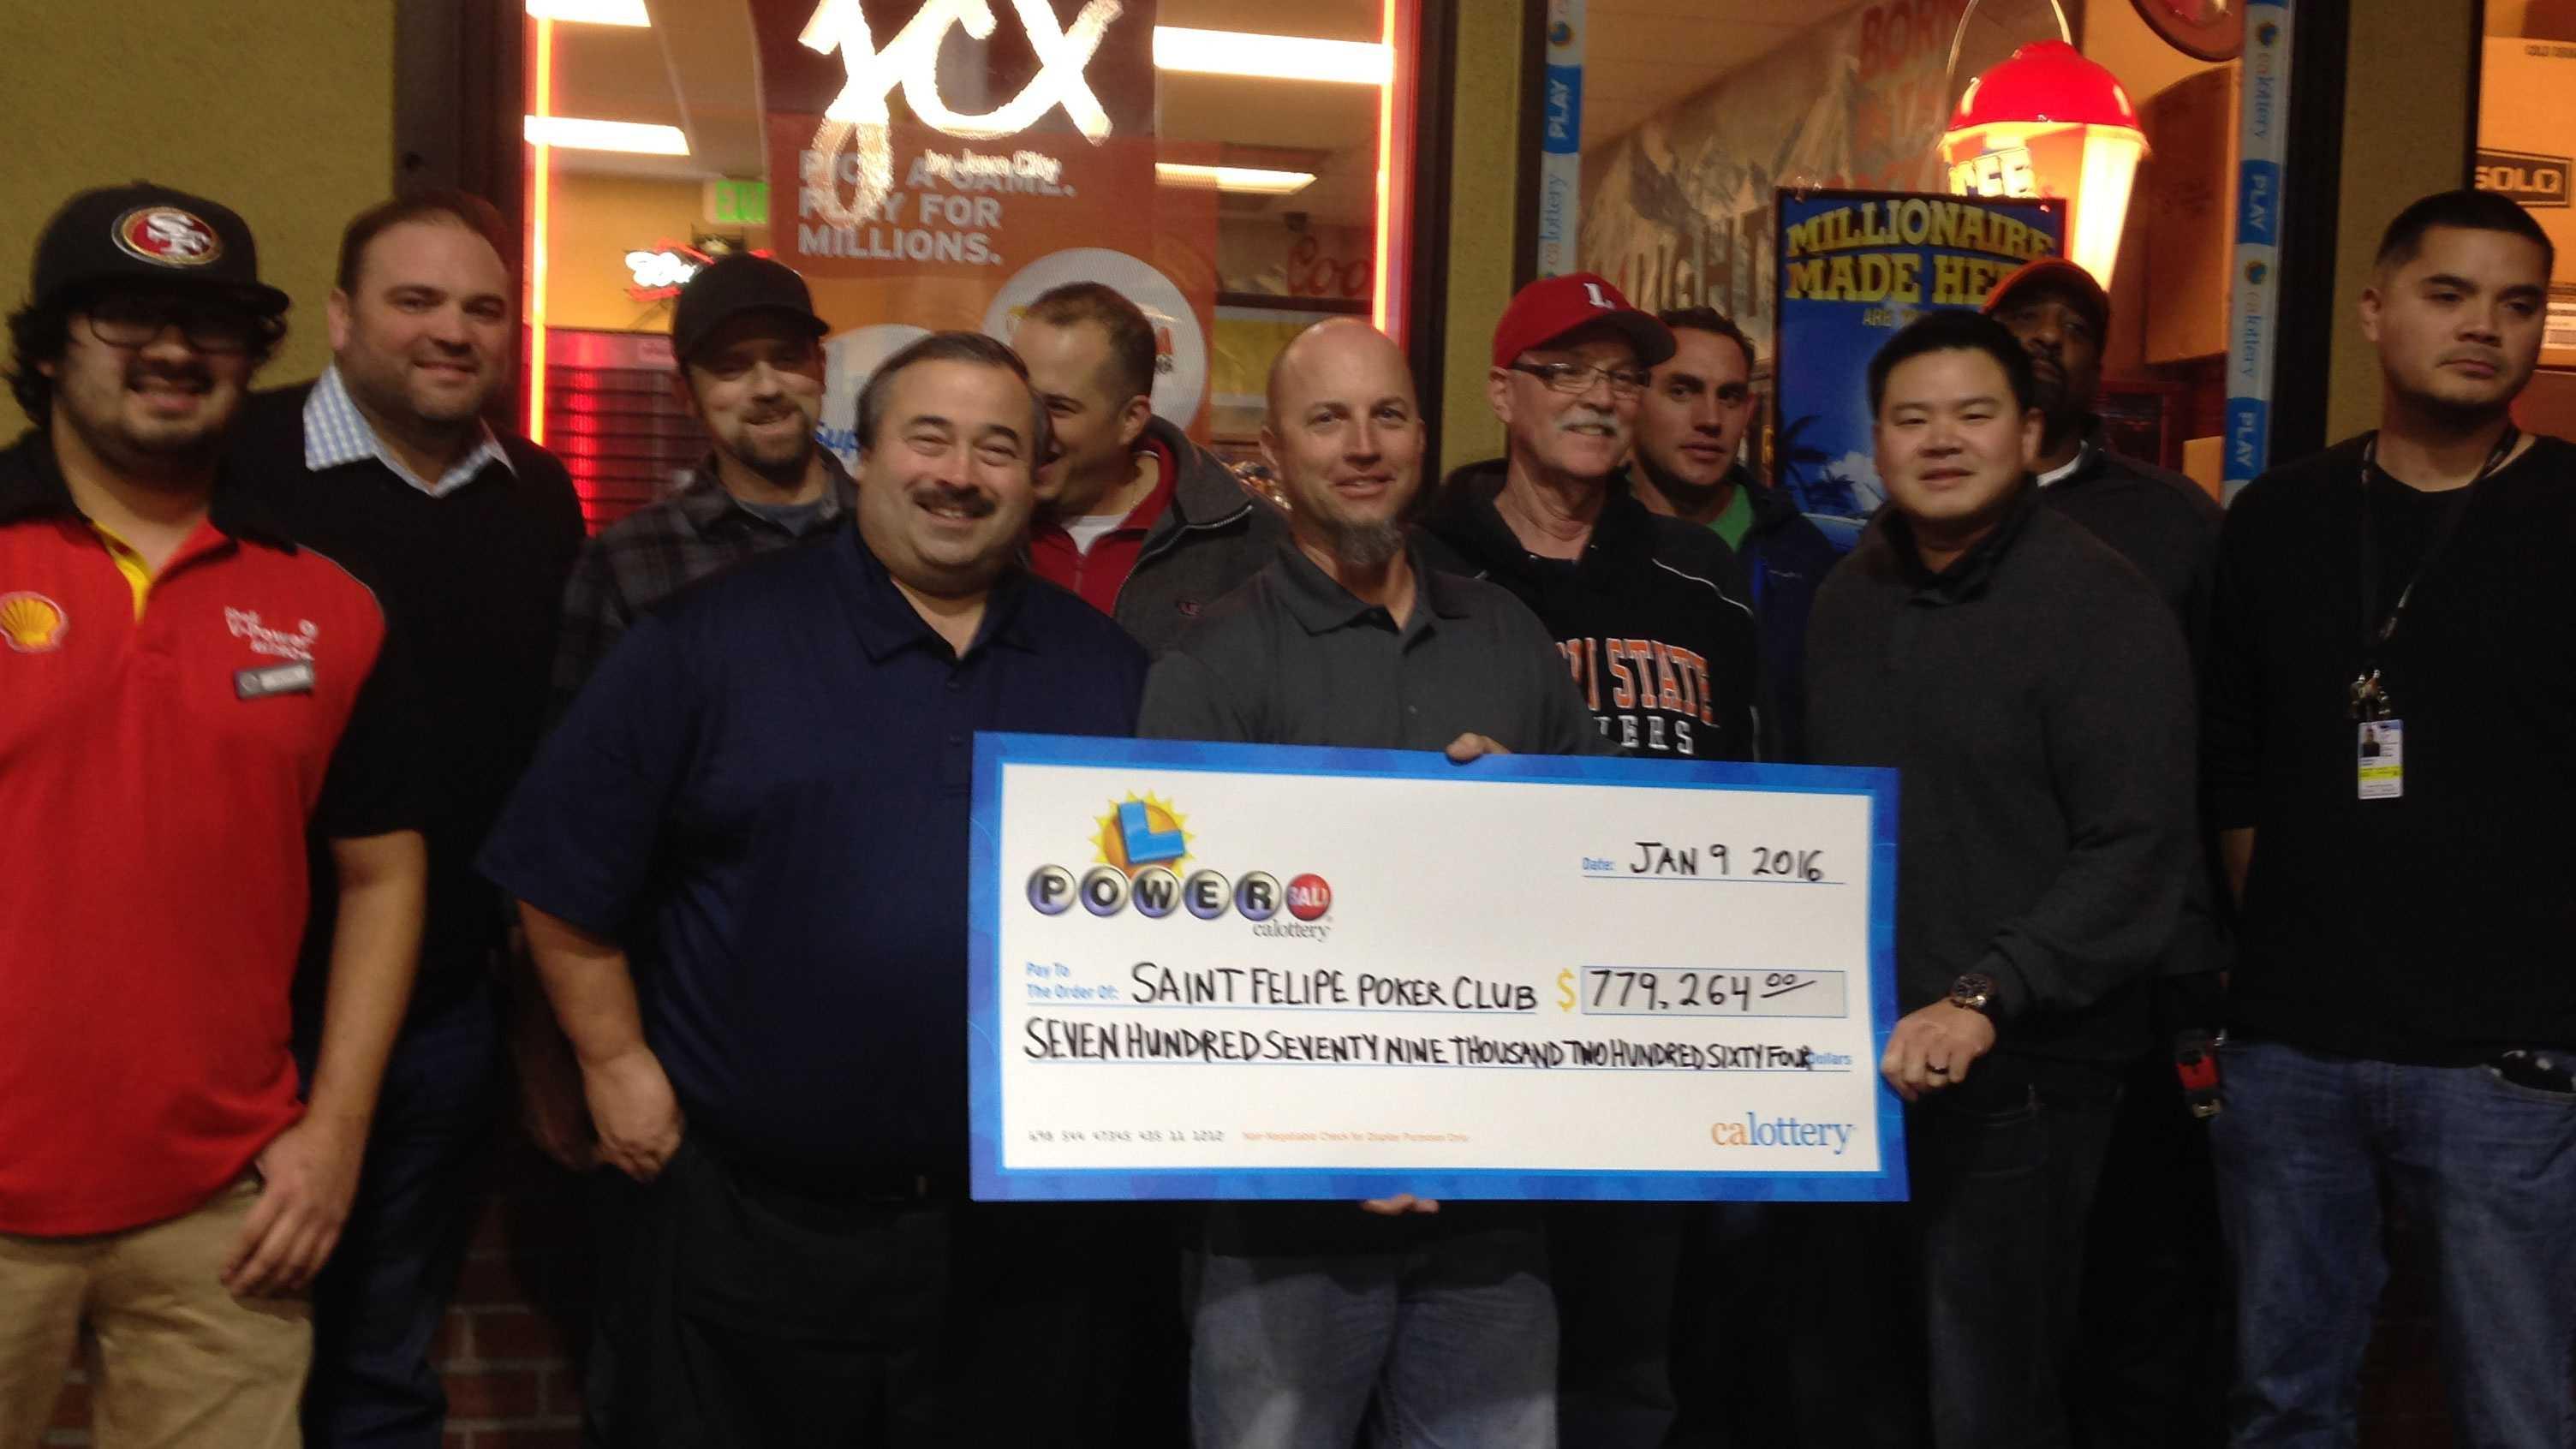 Eleven members of the St. Felipe Poker Club in Stockton won $779,264 in the Powerball lottery. (Jan. 20, 2016)